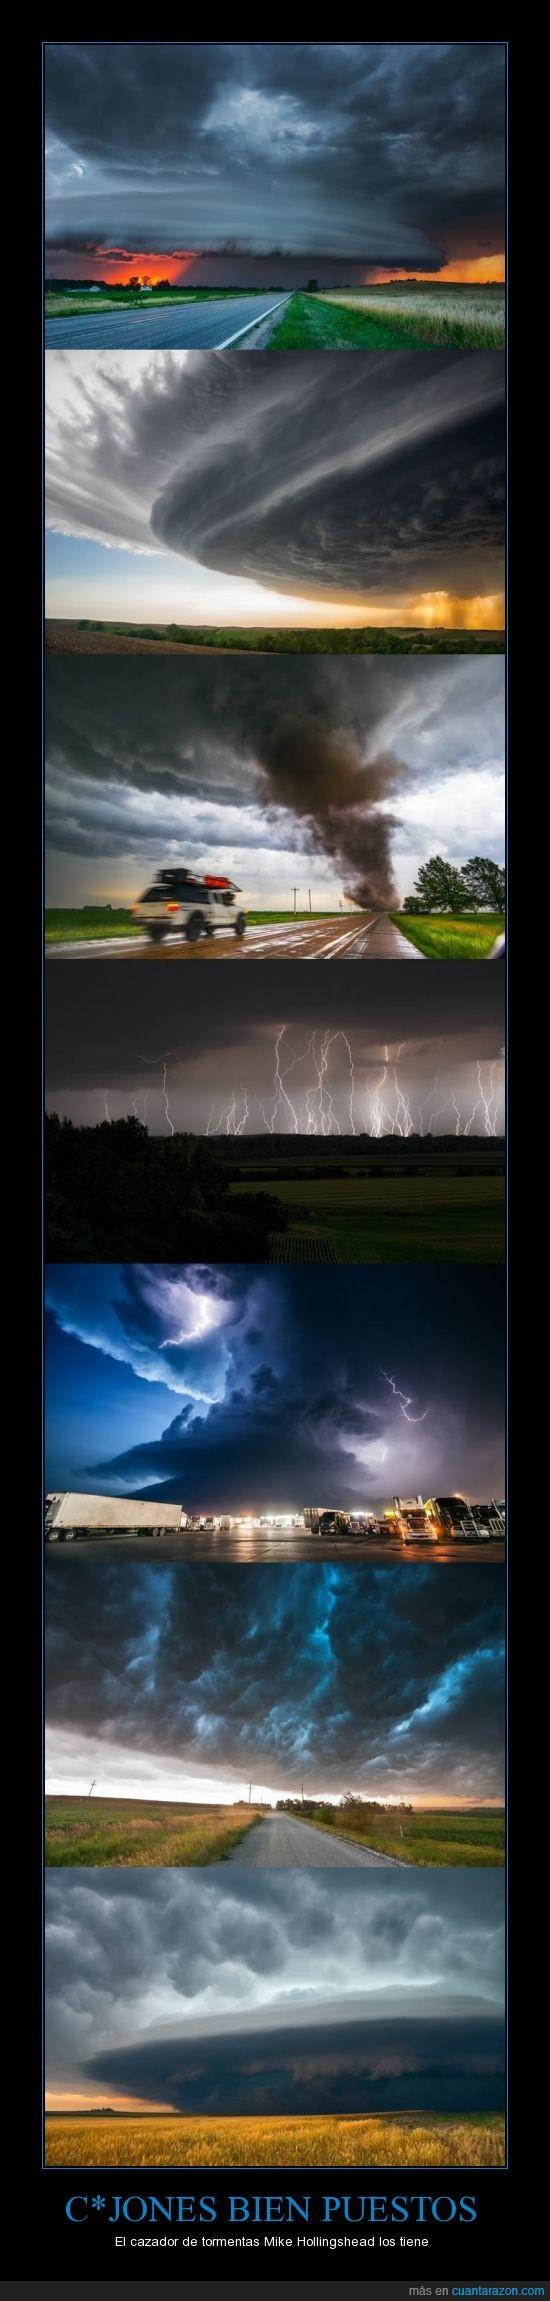 cazador de tormentas,cojones,rayos,Tormentas,tornado